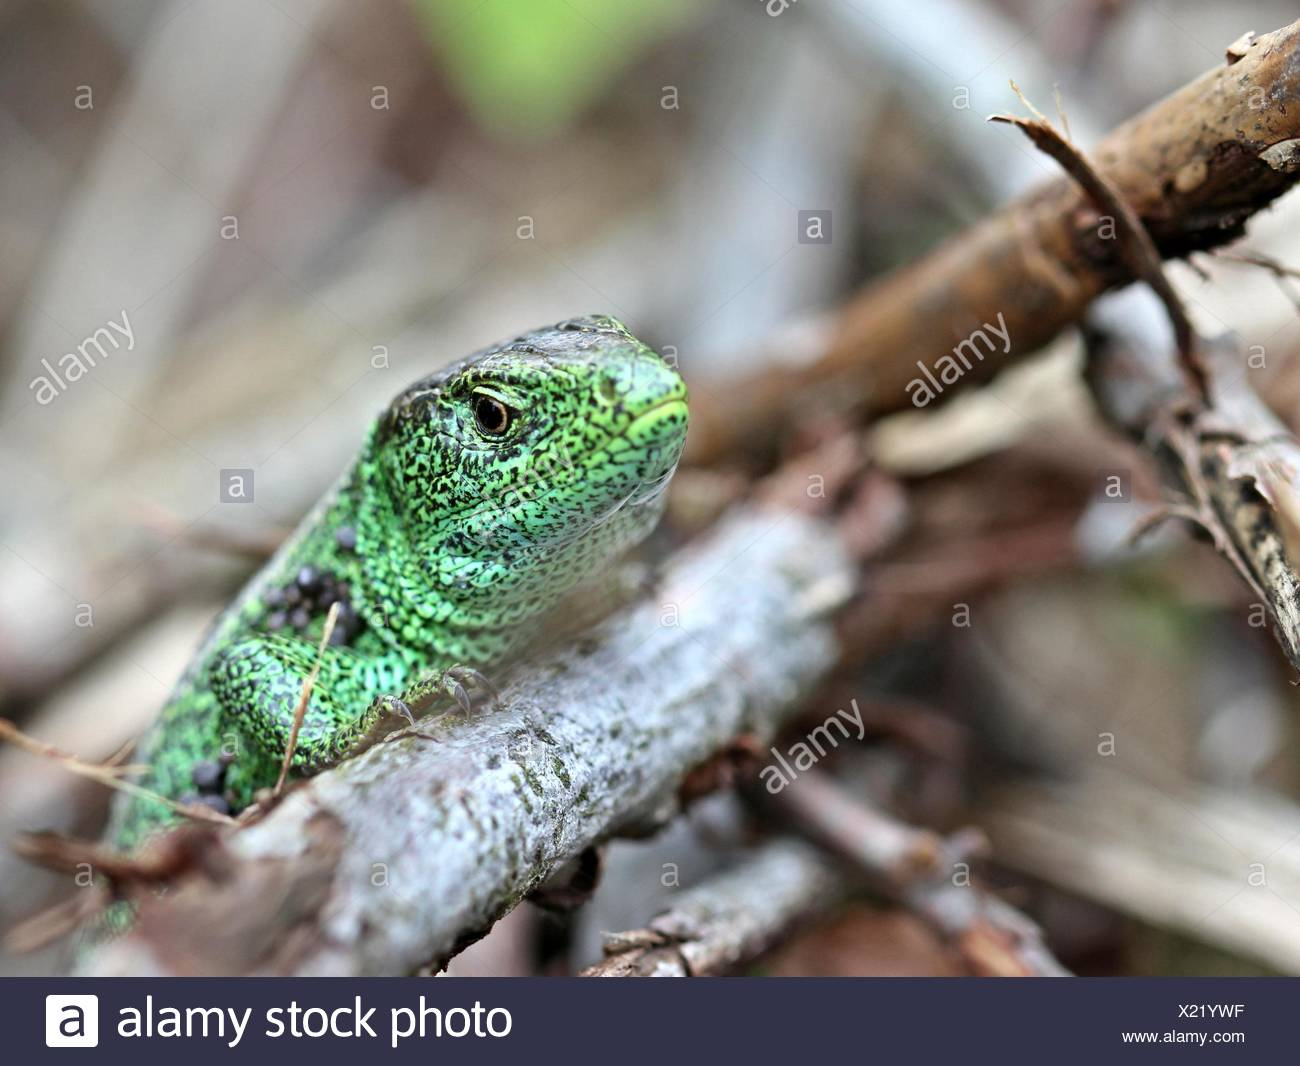 male sand lizard on drnberg - Stock Image